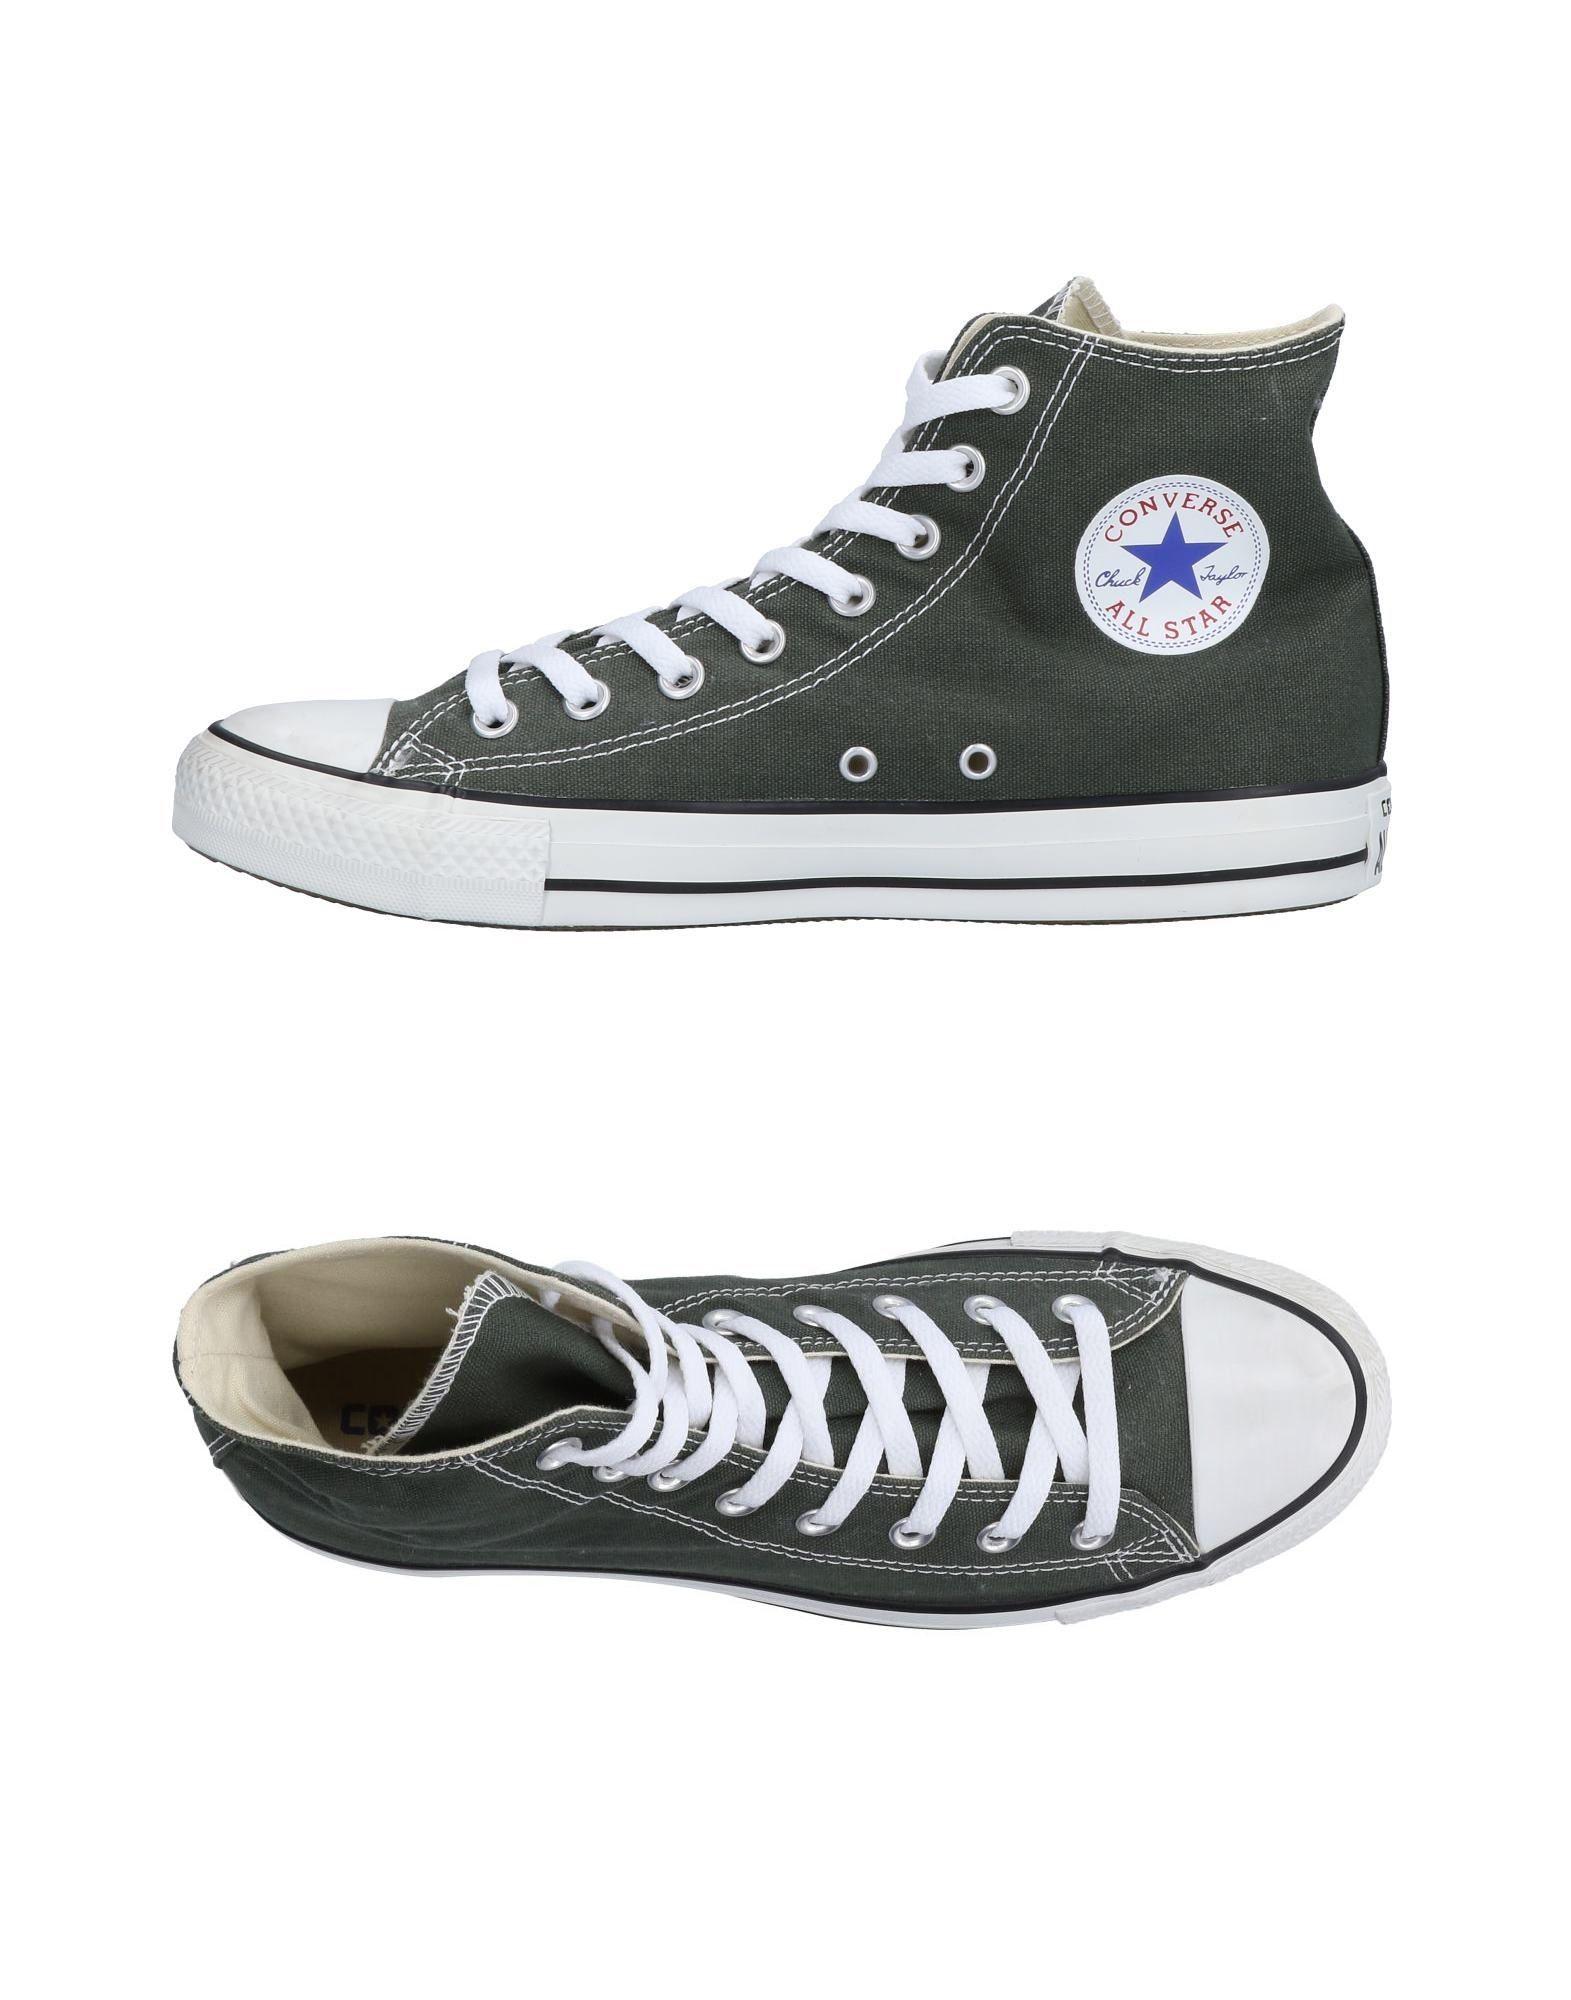 Scarpe da Ginnastica Converse - All Star Uomo - Converse 11516804OB 60647c